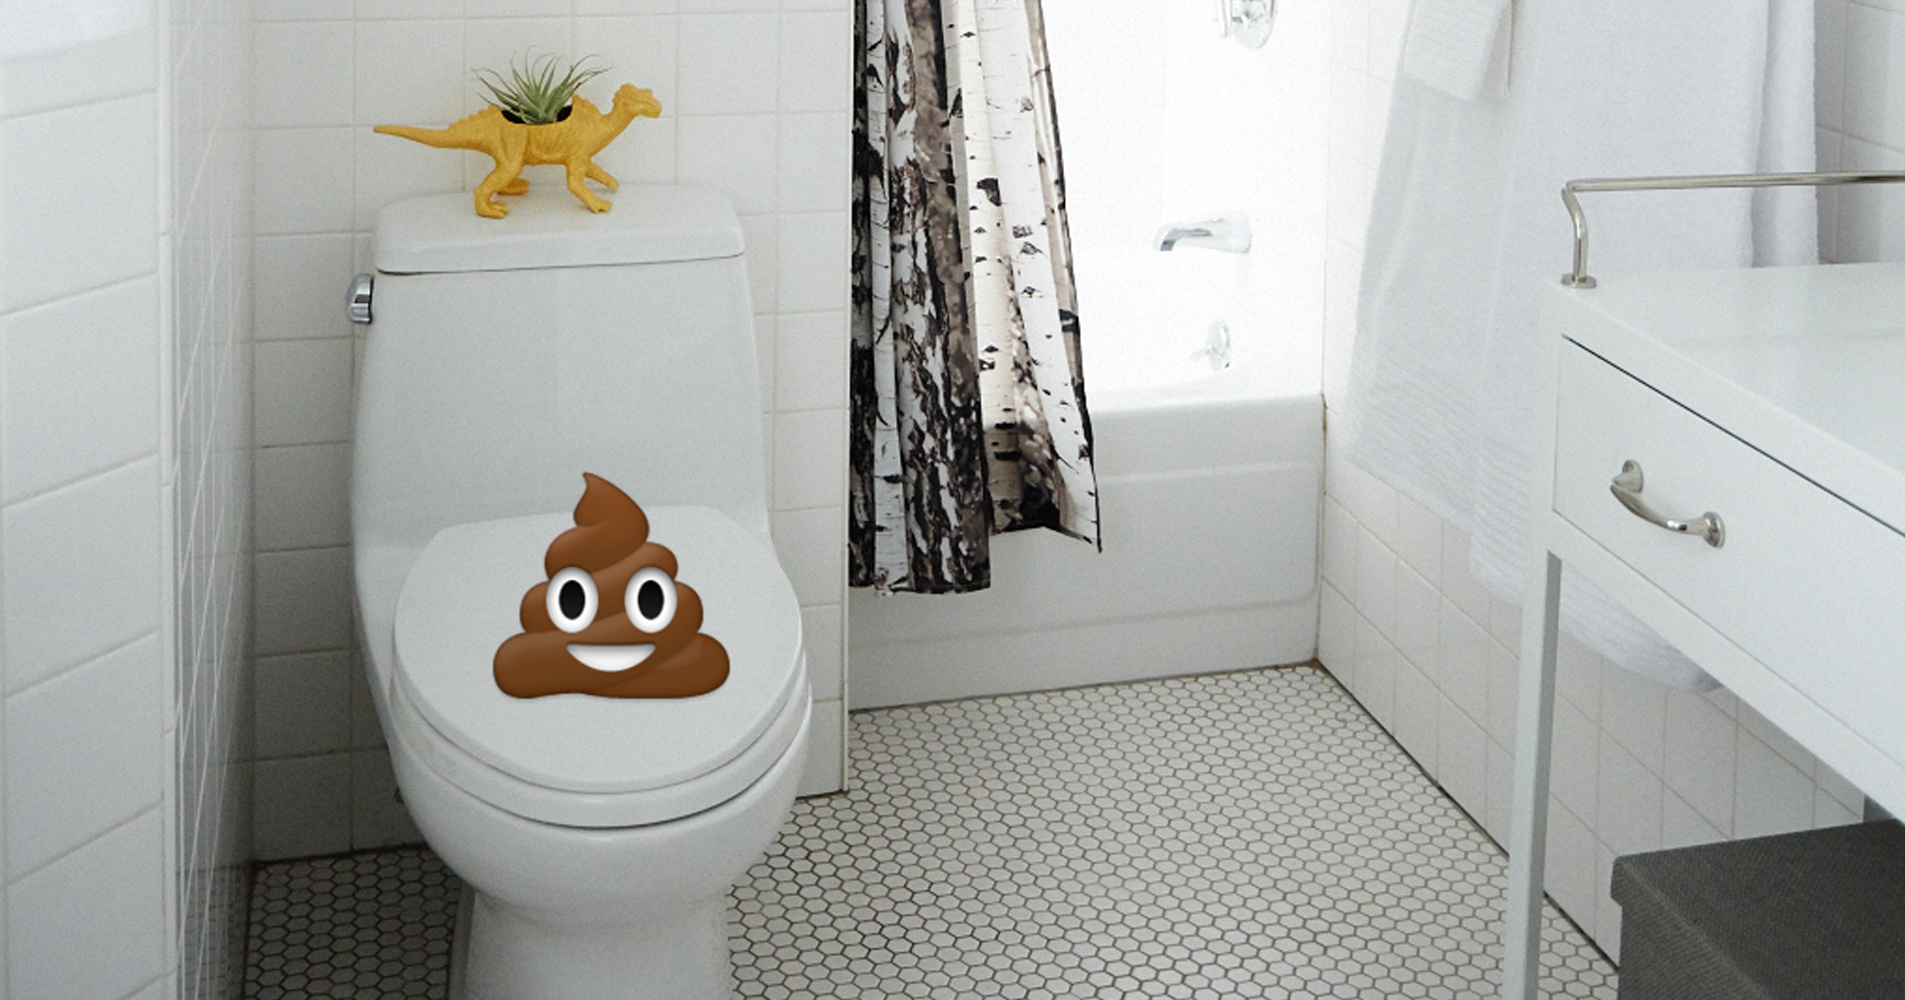 klogefl ster unangenehmer geruch auf der toilette. Black Bedroom Furniture Sets. Home Design Ideas